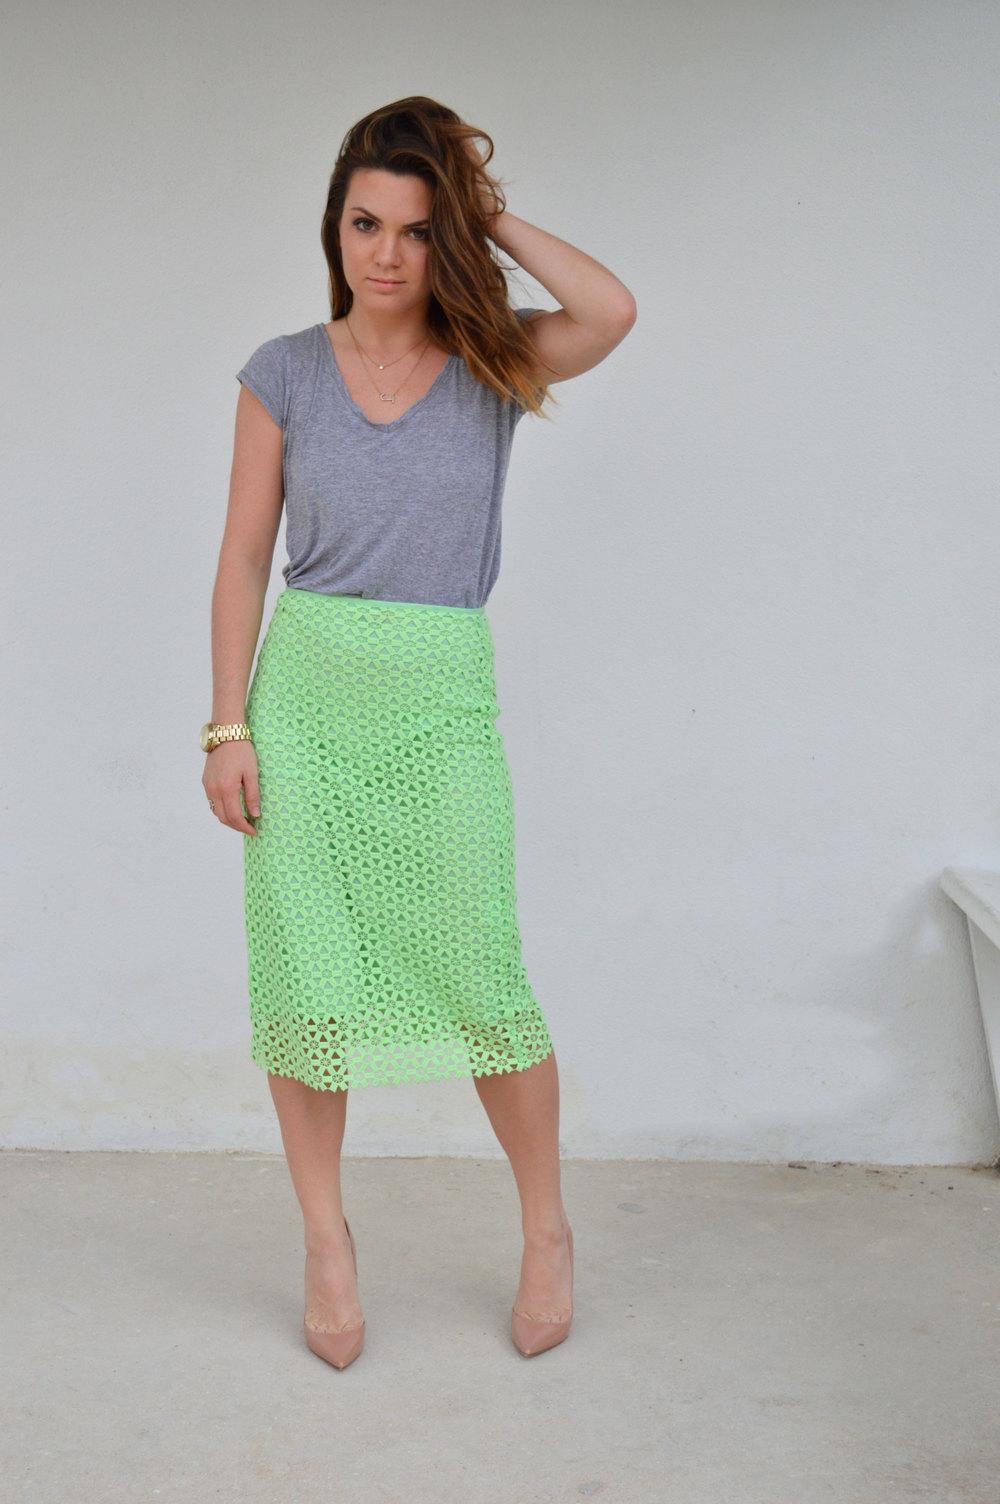 Zara Green Pencil Skirt Summer Staple HM shirt Christian Louboutin Heels Spring Blog Blogger Nassau Bahamas Miami